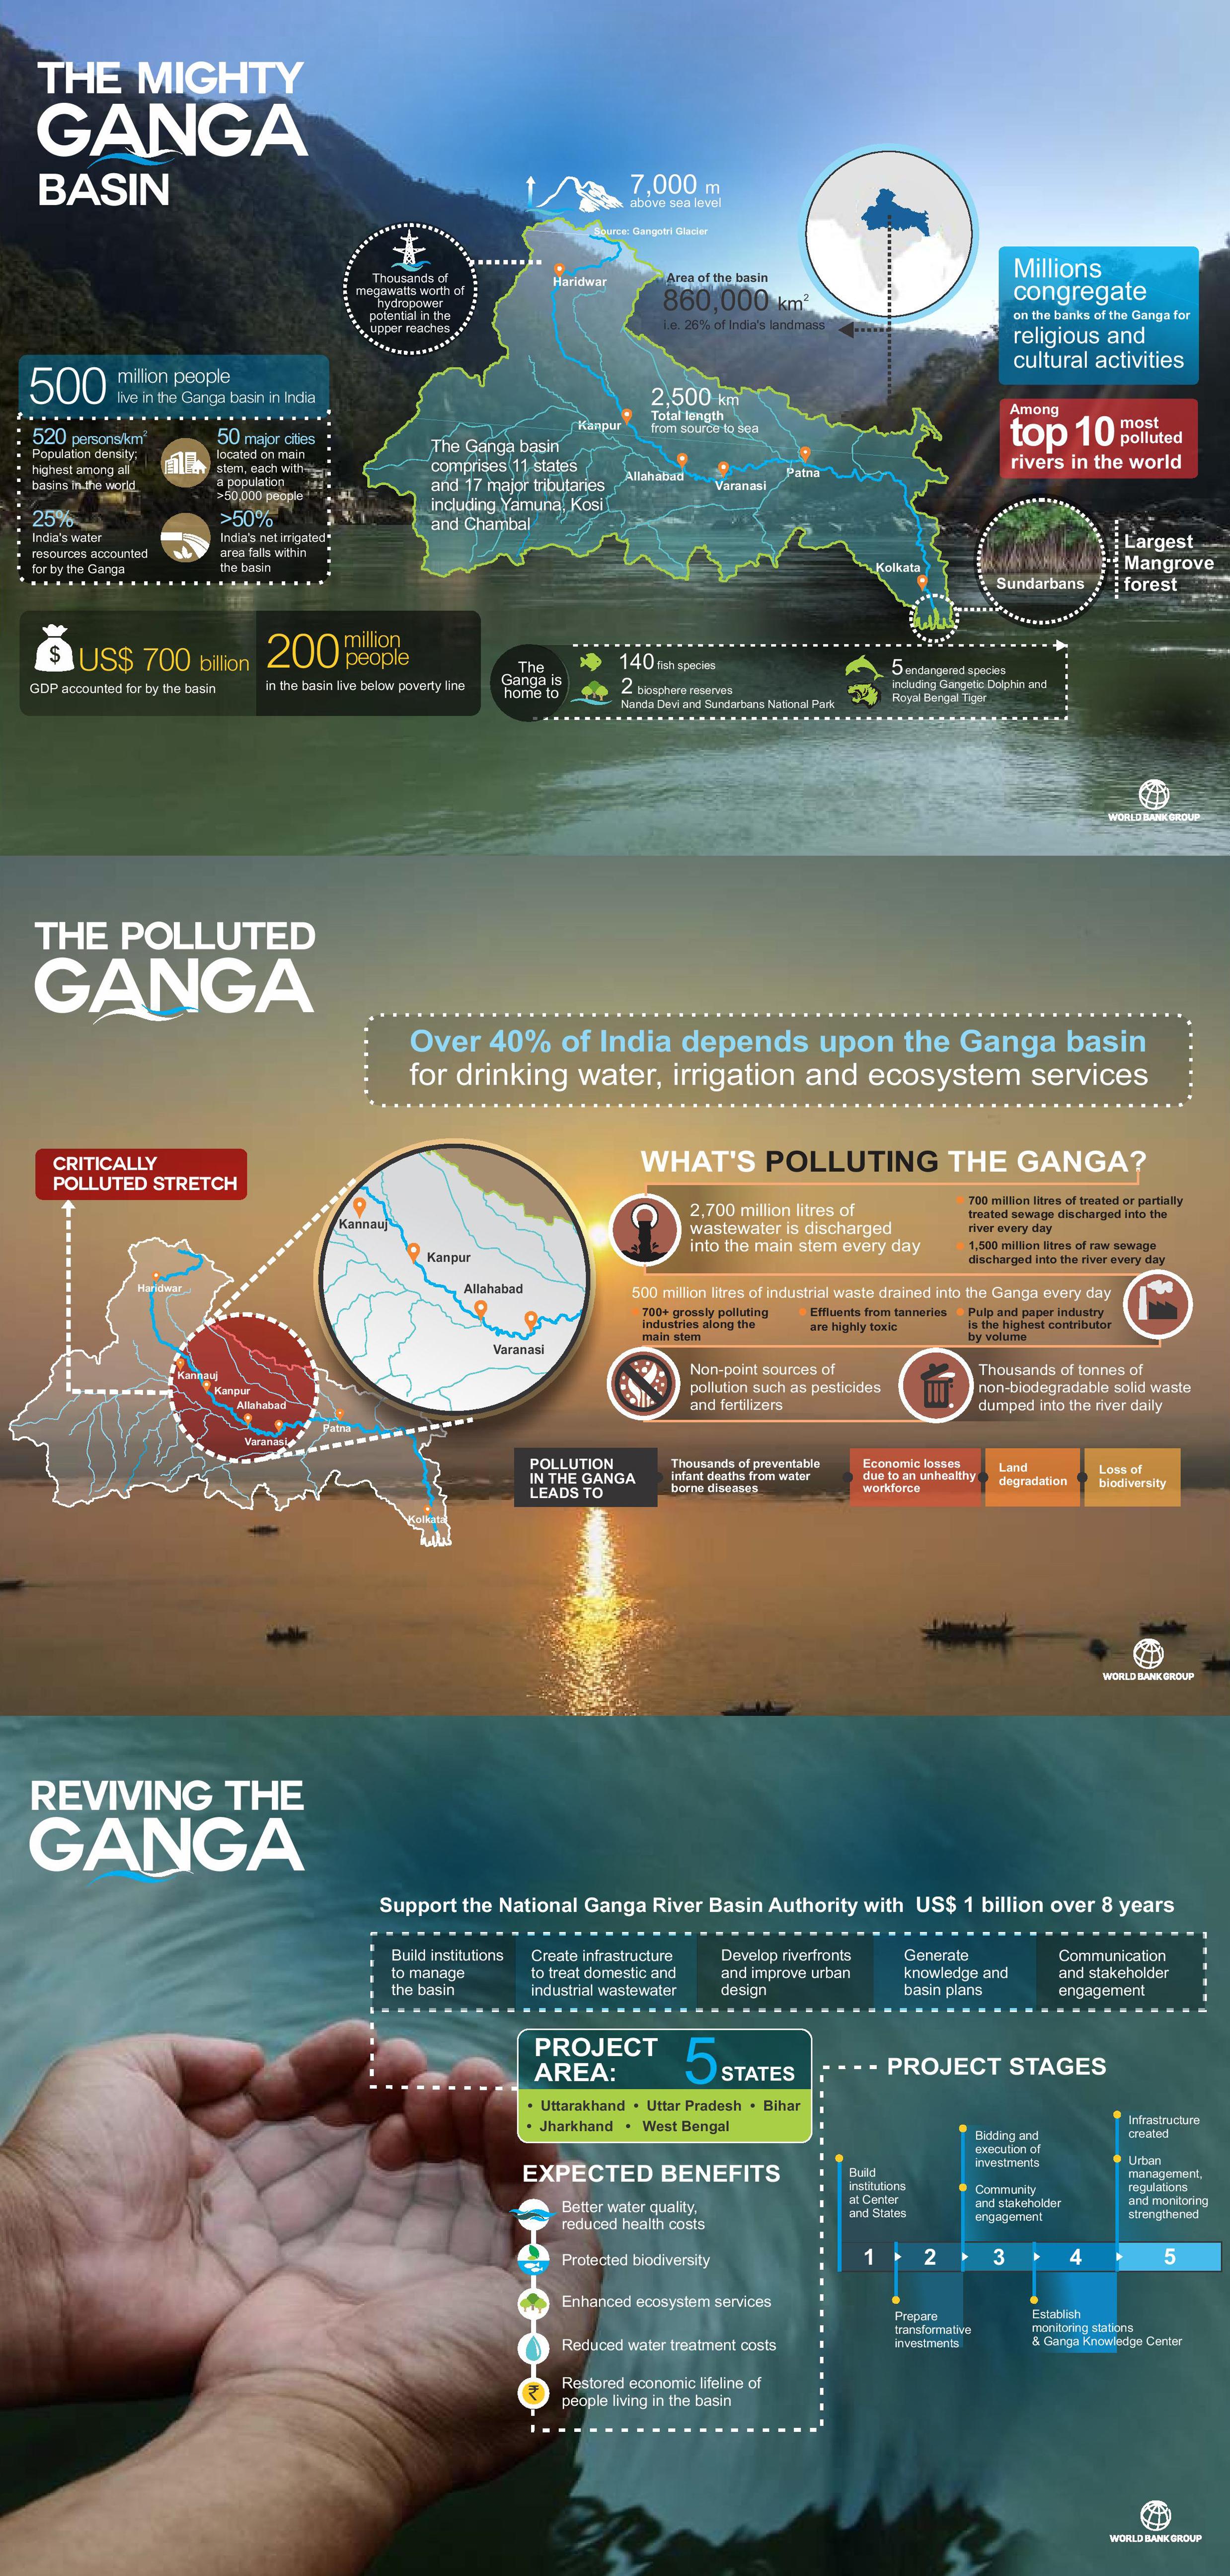 the mighty ganga basin